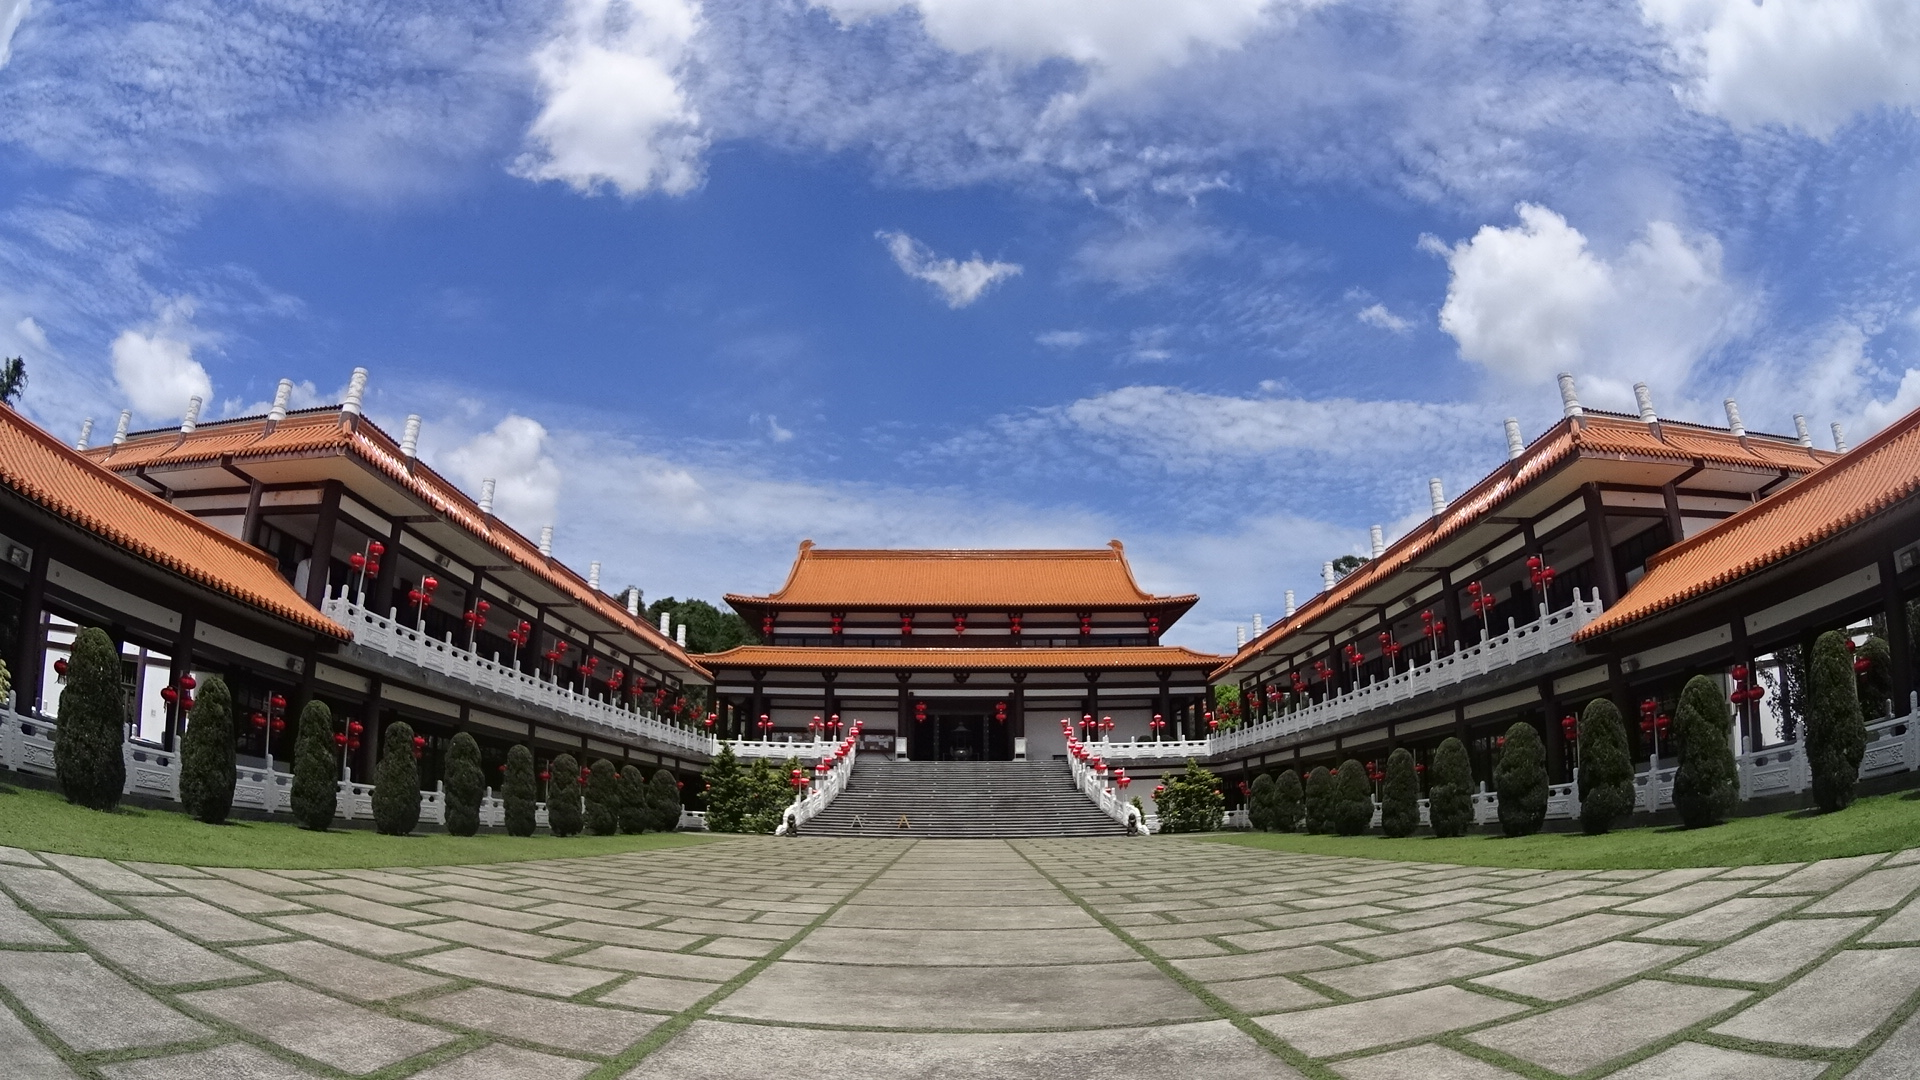 templo zu lai passeio cultural sp cotia budismo